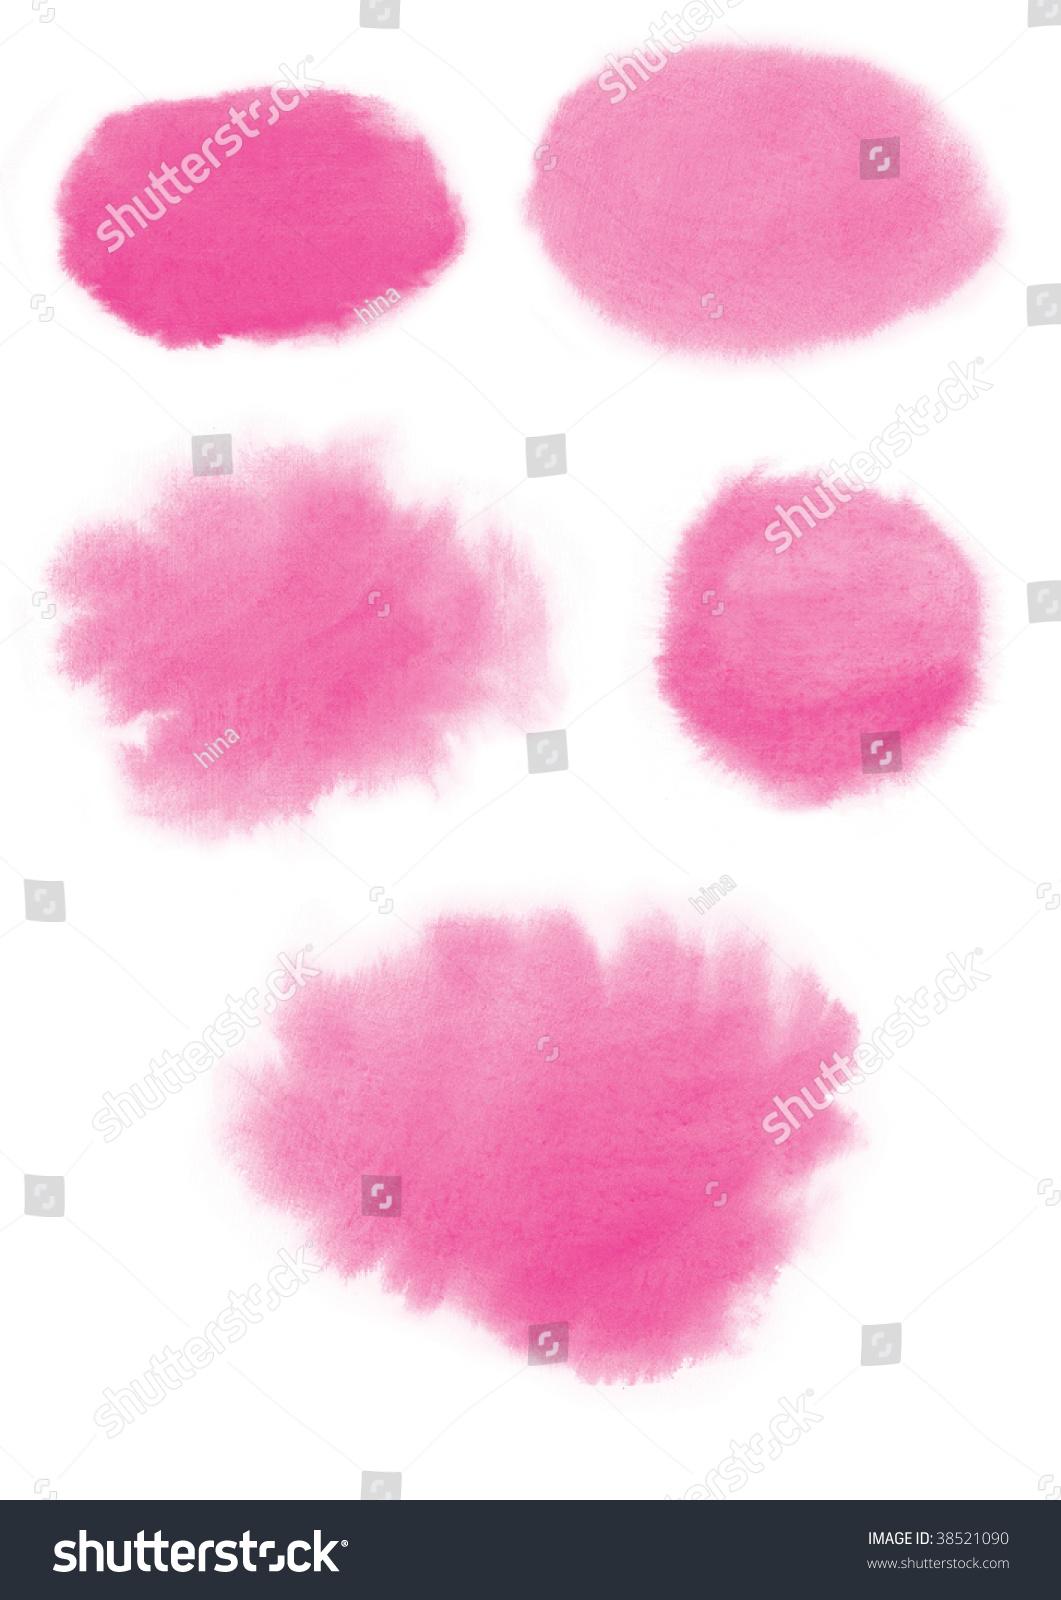 Watercolor Frames Pink Stock Illustration 38521090 - Shutterstock